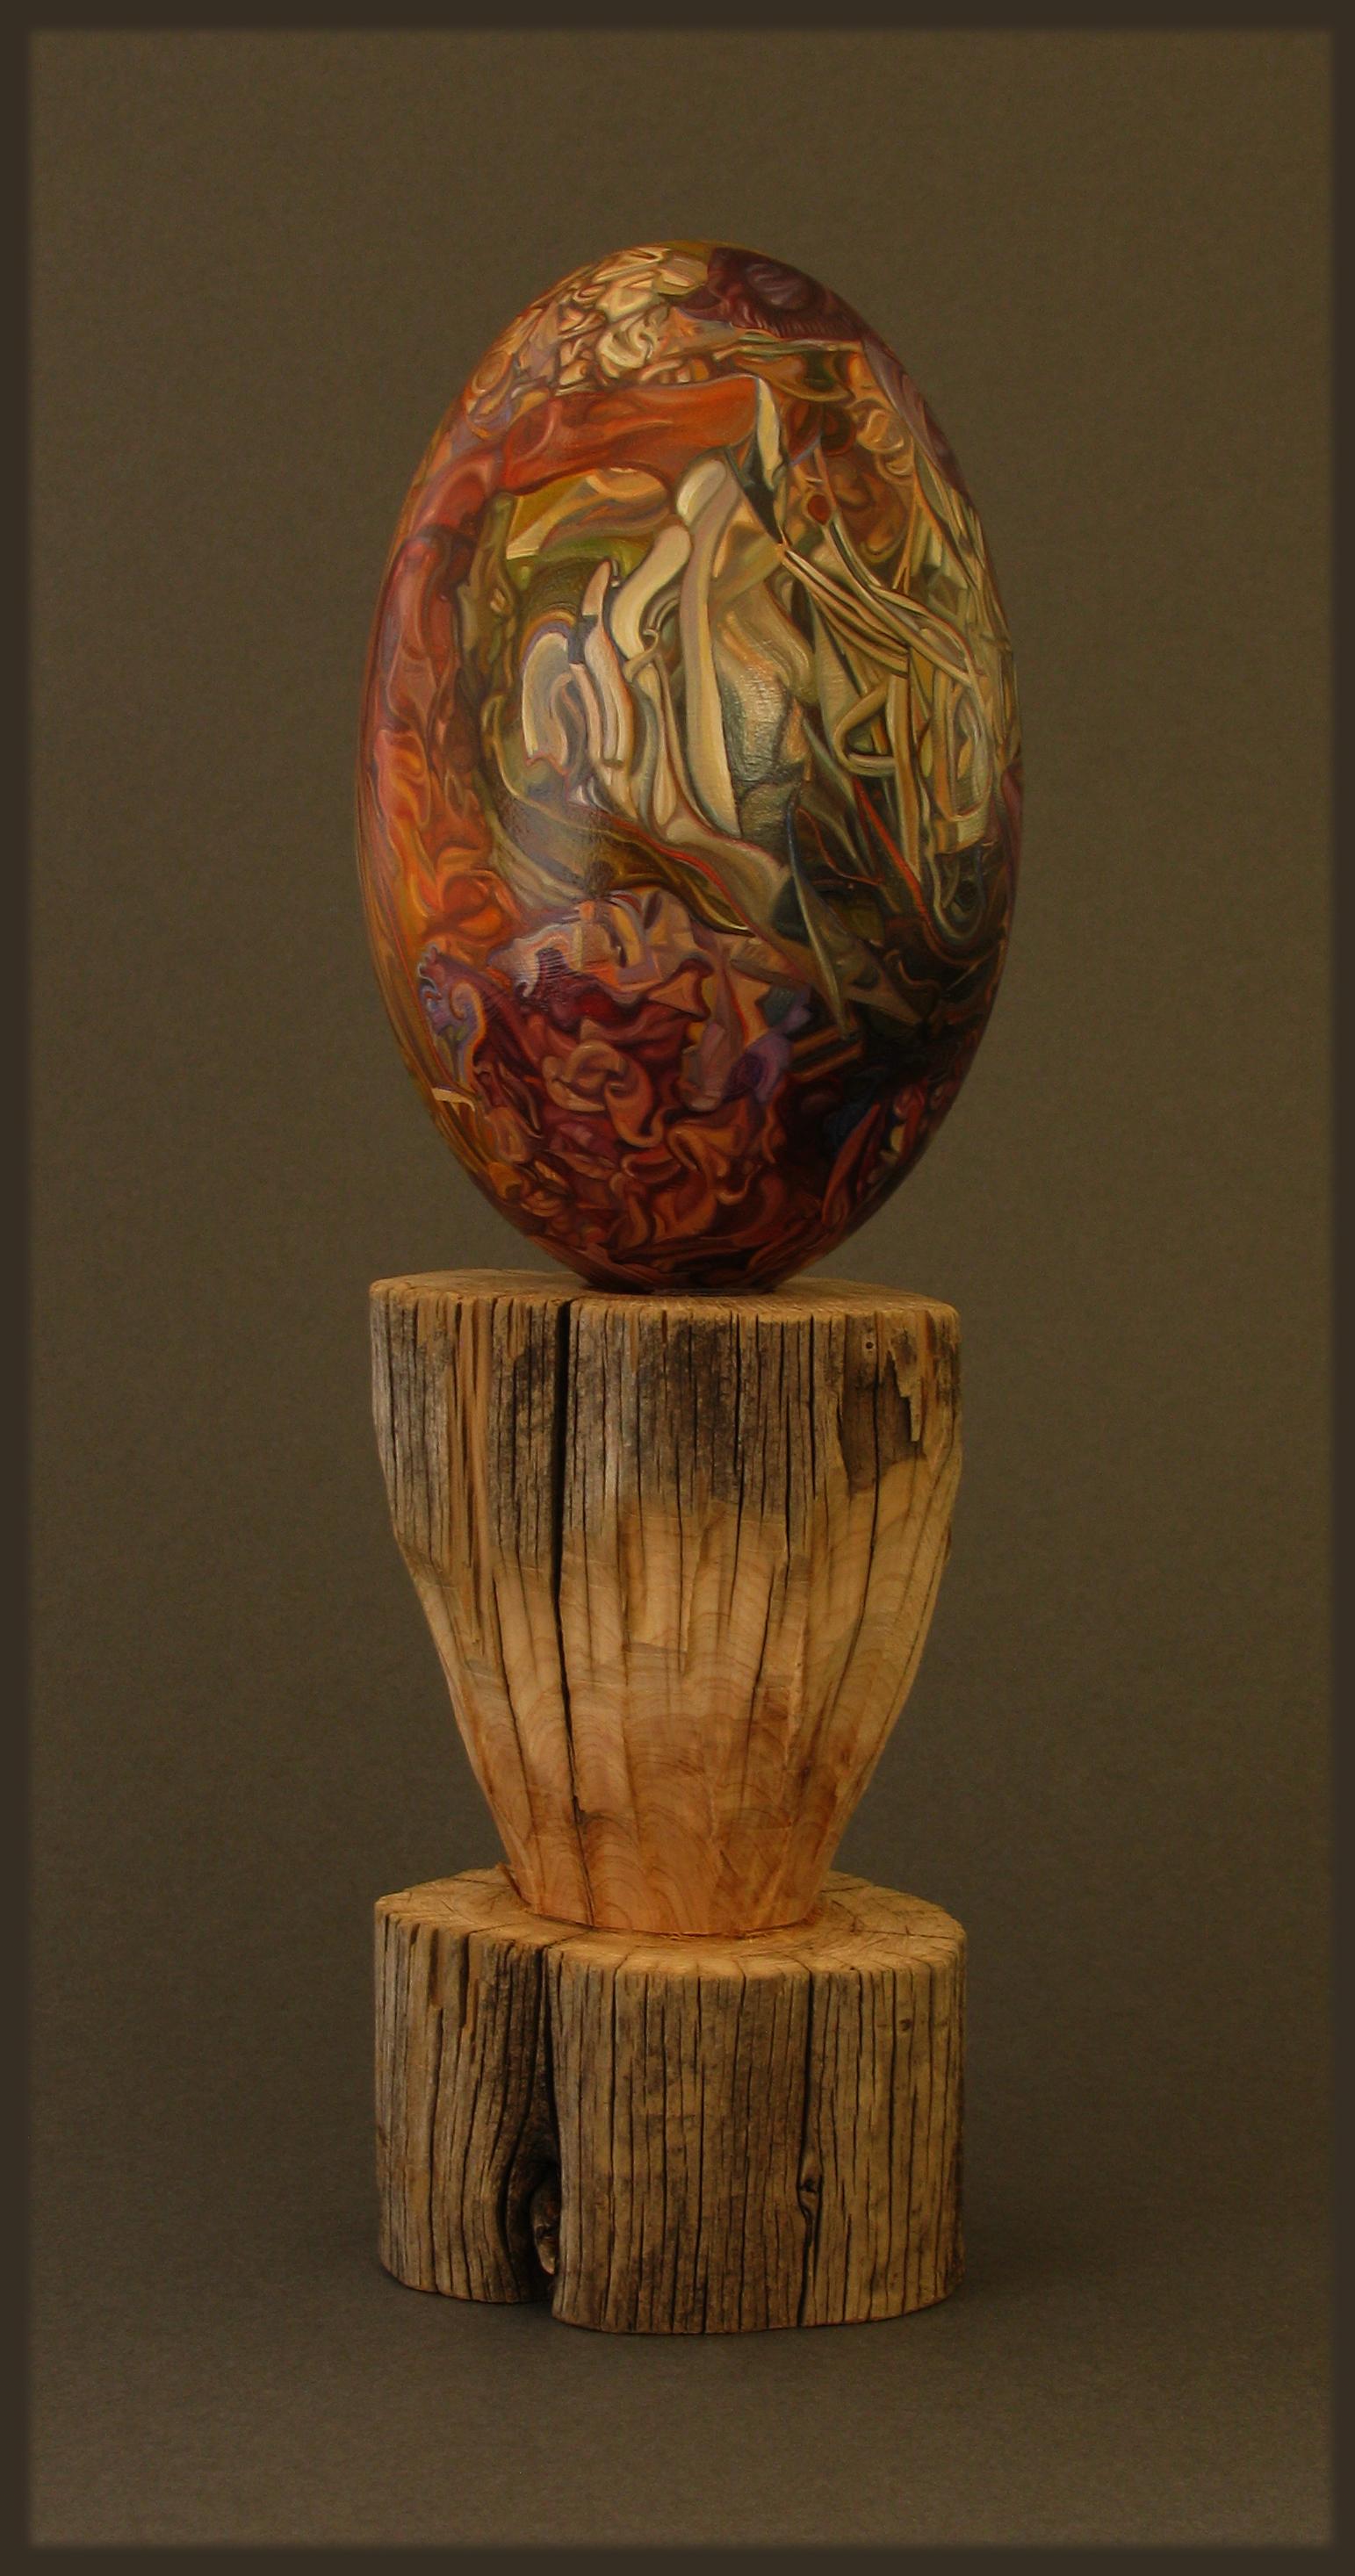 Iris & Her Rivers of Saffron